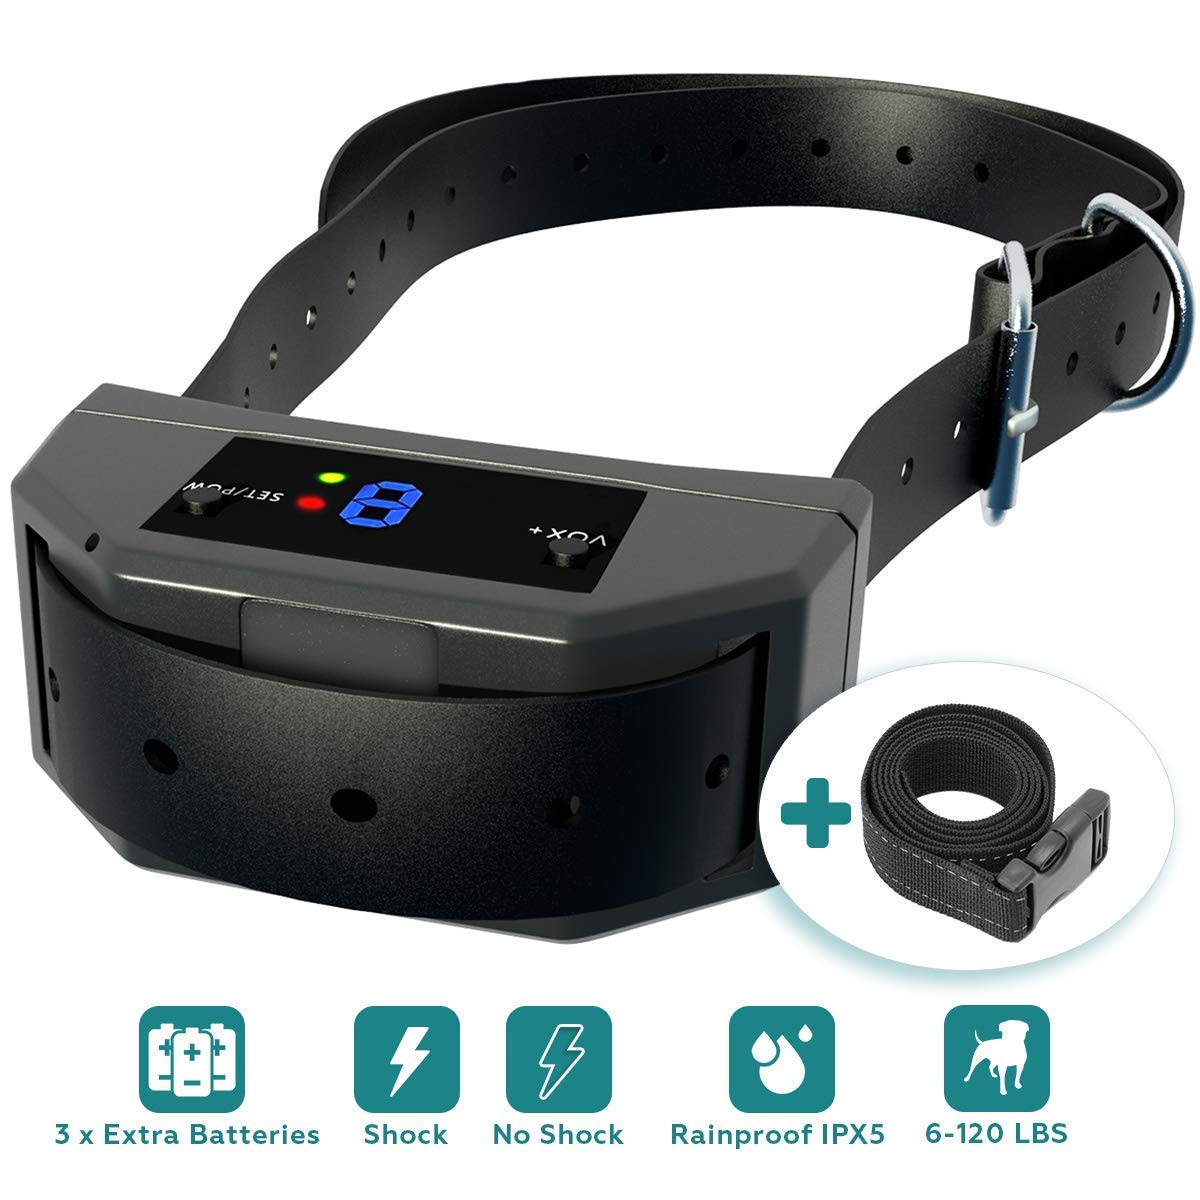 ELZU.US [Newest 2019 Upgraded] Bark Collar w/Upgraded Smart Chip - Best Dog Anti-Barking Collar, Beep/Shock Mode. No Bark Device